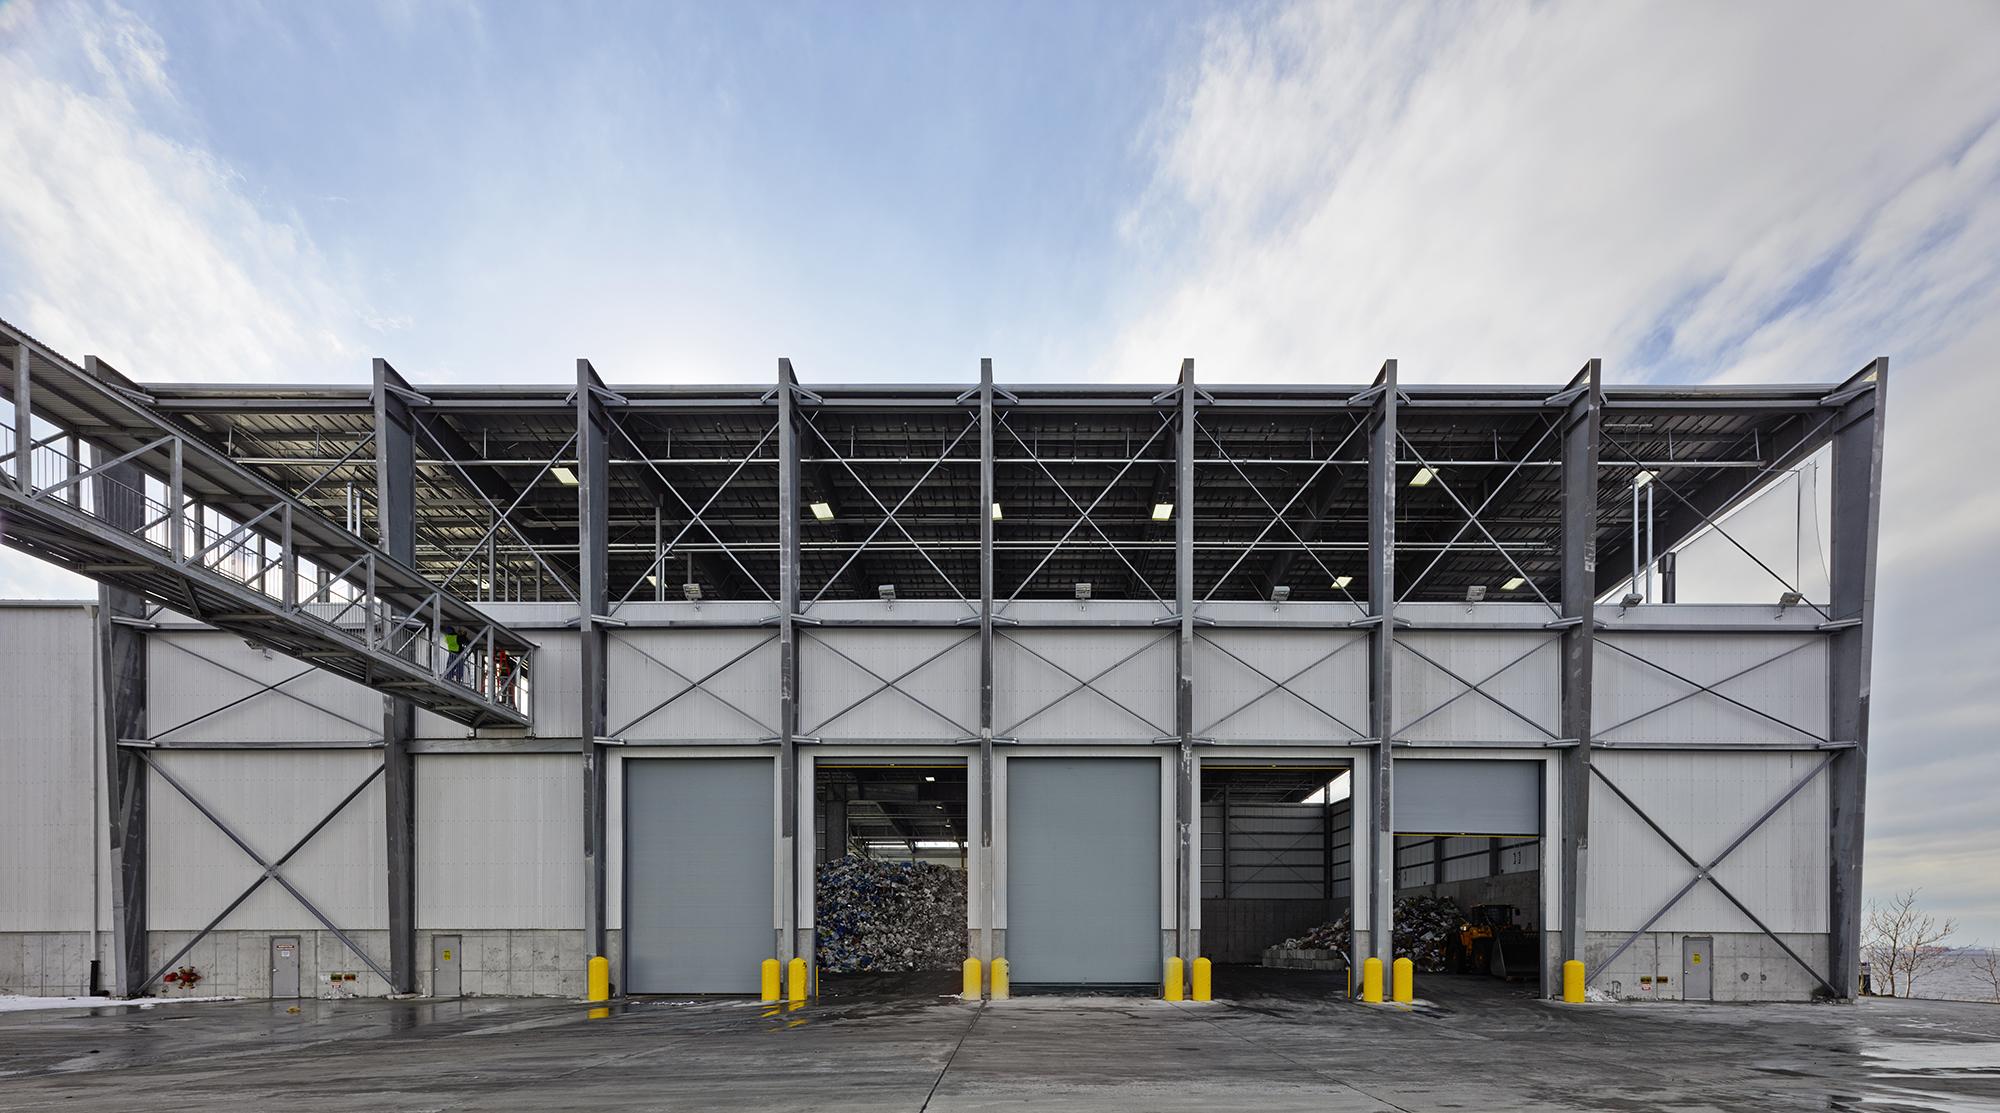 Sunset Park Material Recovery Facility, Brooklyn, NY, Selldorf Architects.Photo: Jason Schmidt, courtesy of Selldorf Architects.